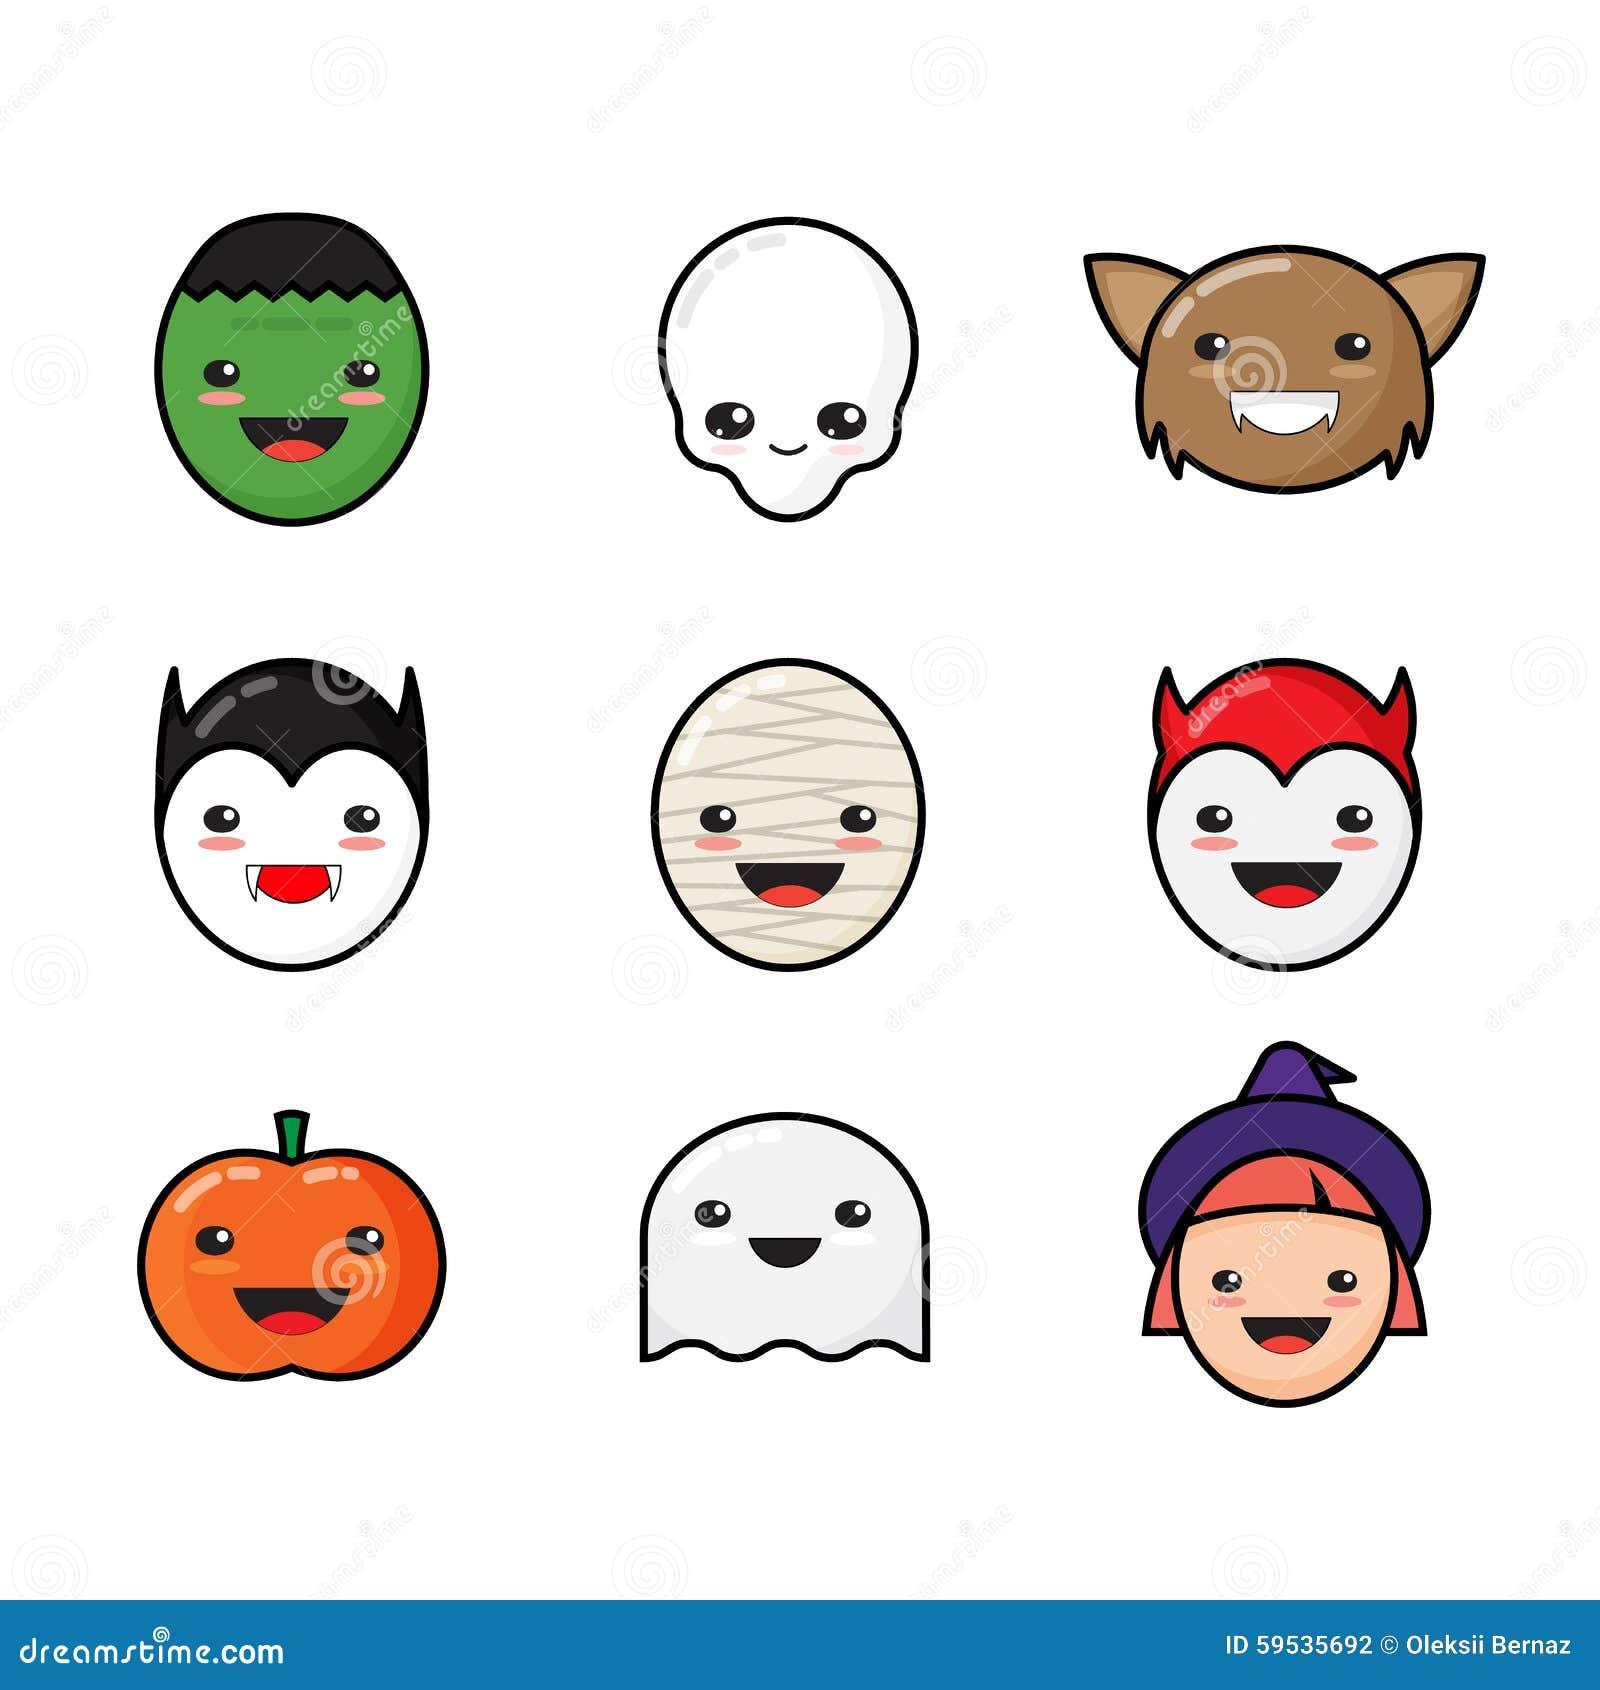 Cute Halloween Decorations Pinterest: Cute Kawaii Halloween Icons Set. Funny Monster Stock